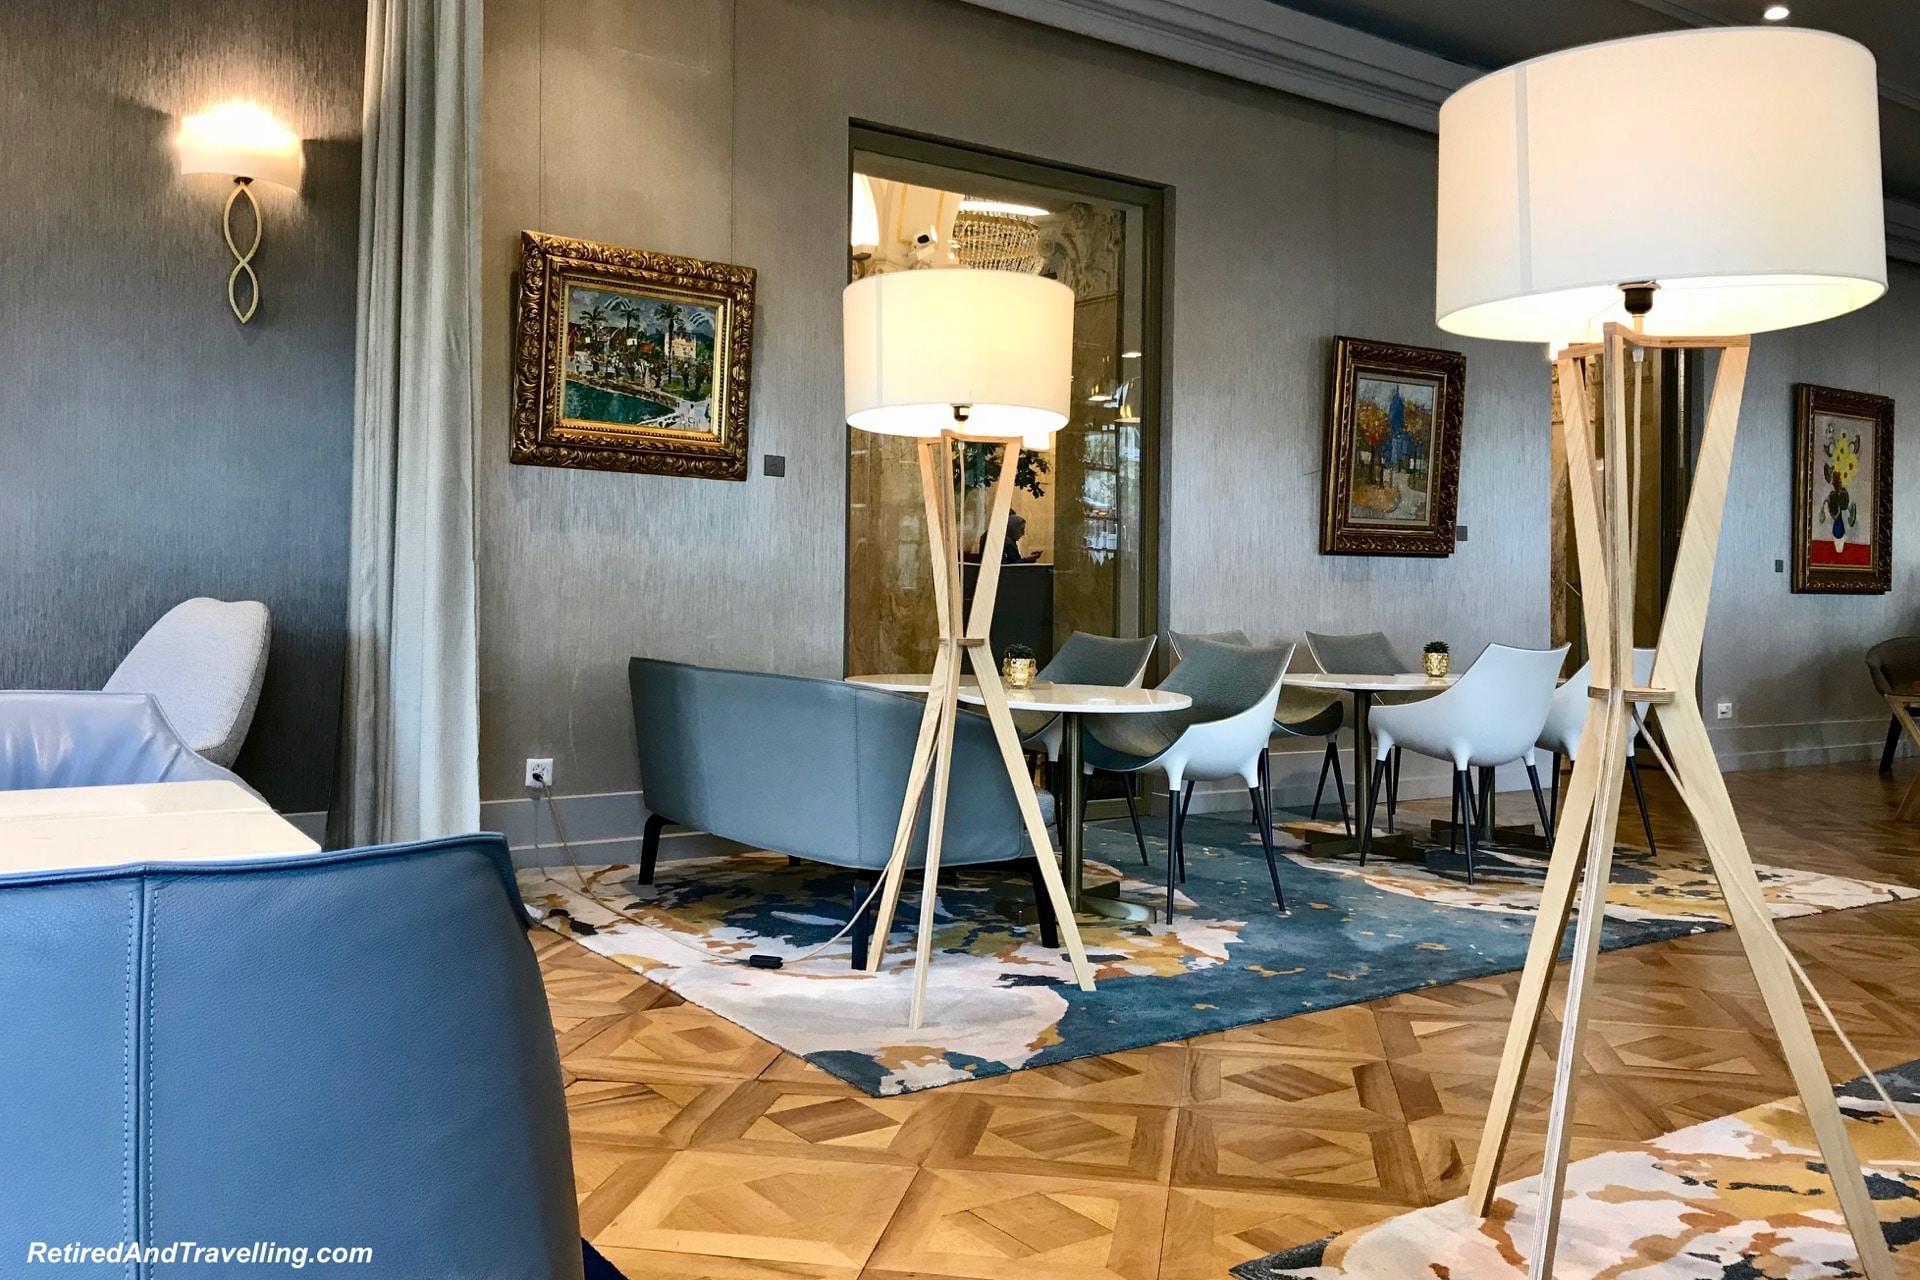 GenevaFoodRitzLivingRoom-2018-05-24-10-39.jpg